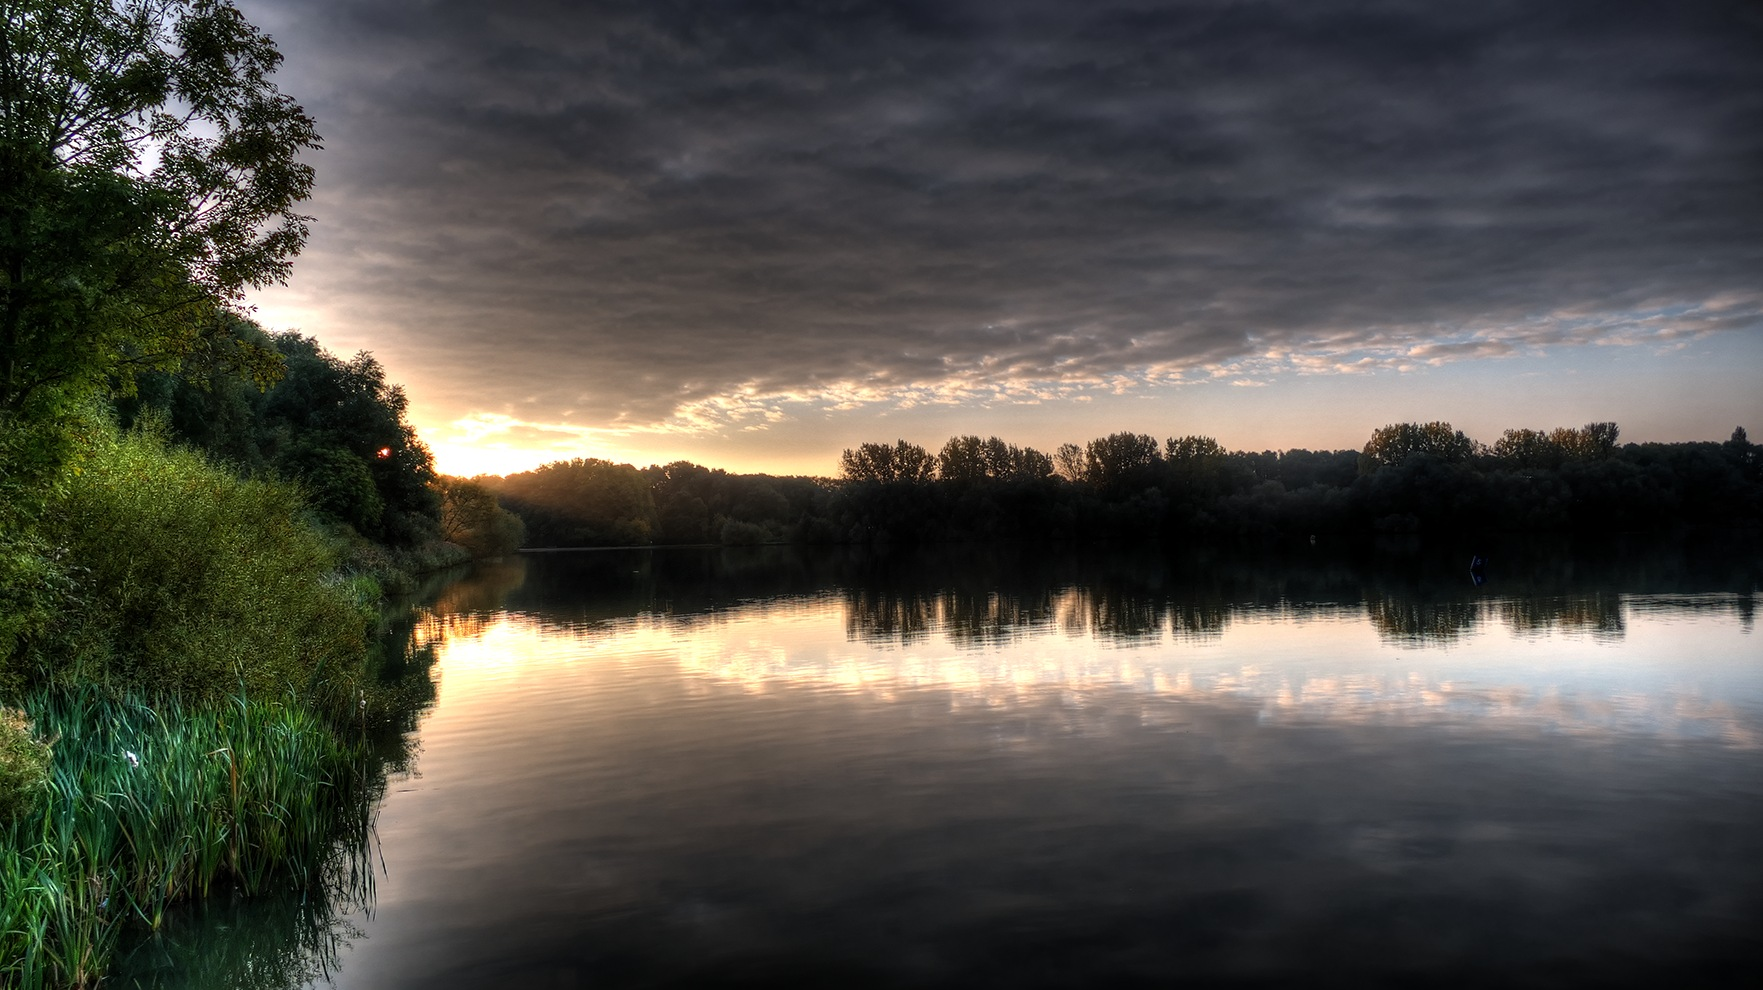 Priory Marina  - Sunrise 2 by Steven Iodice